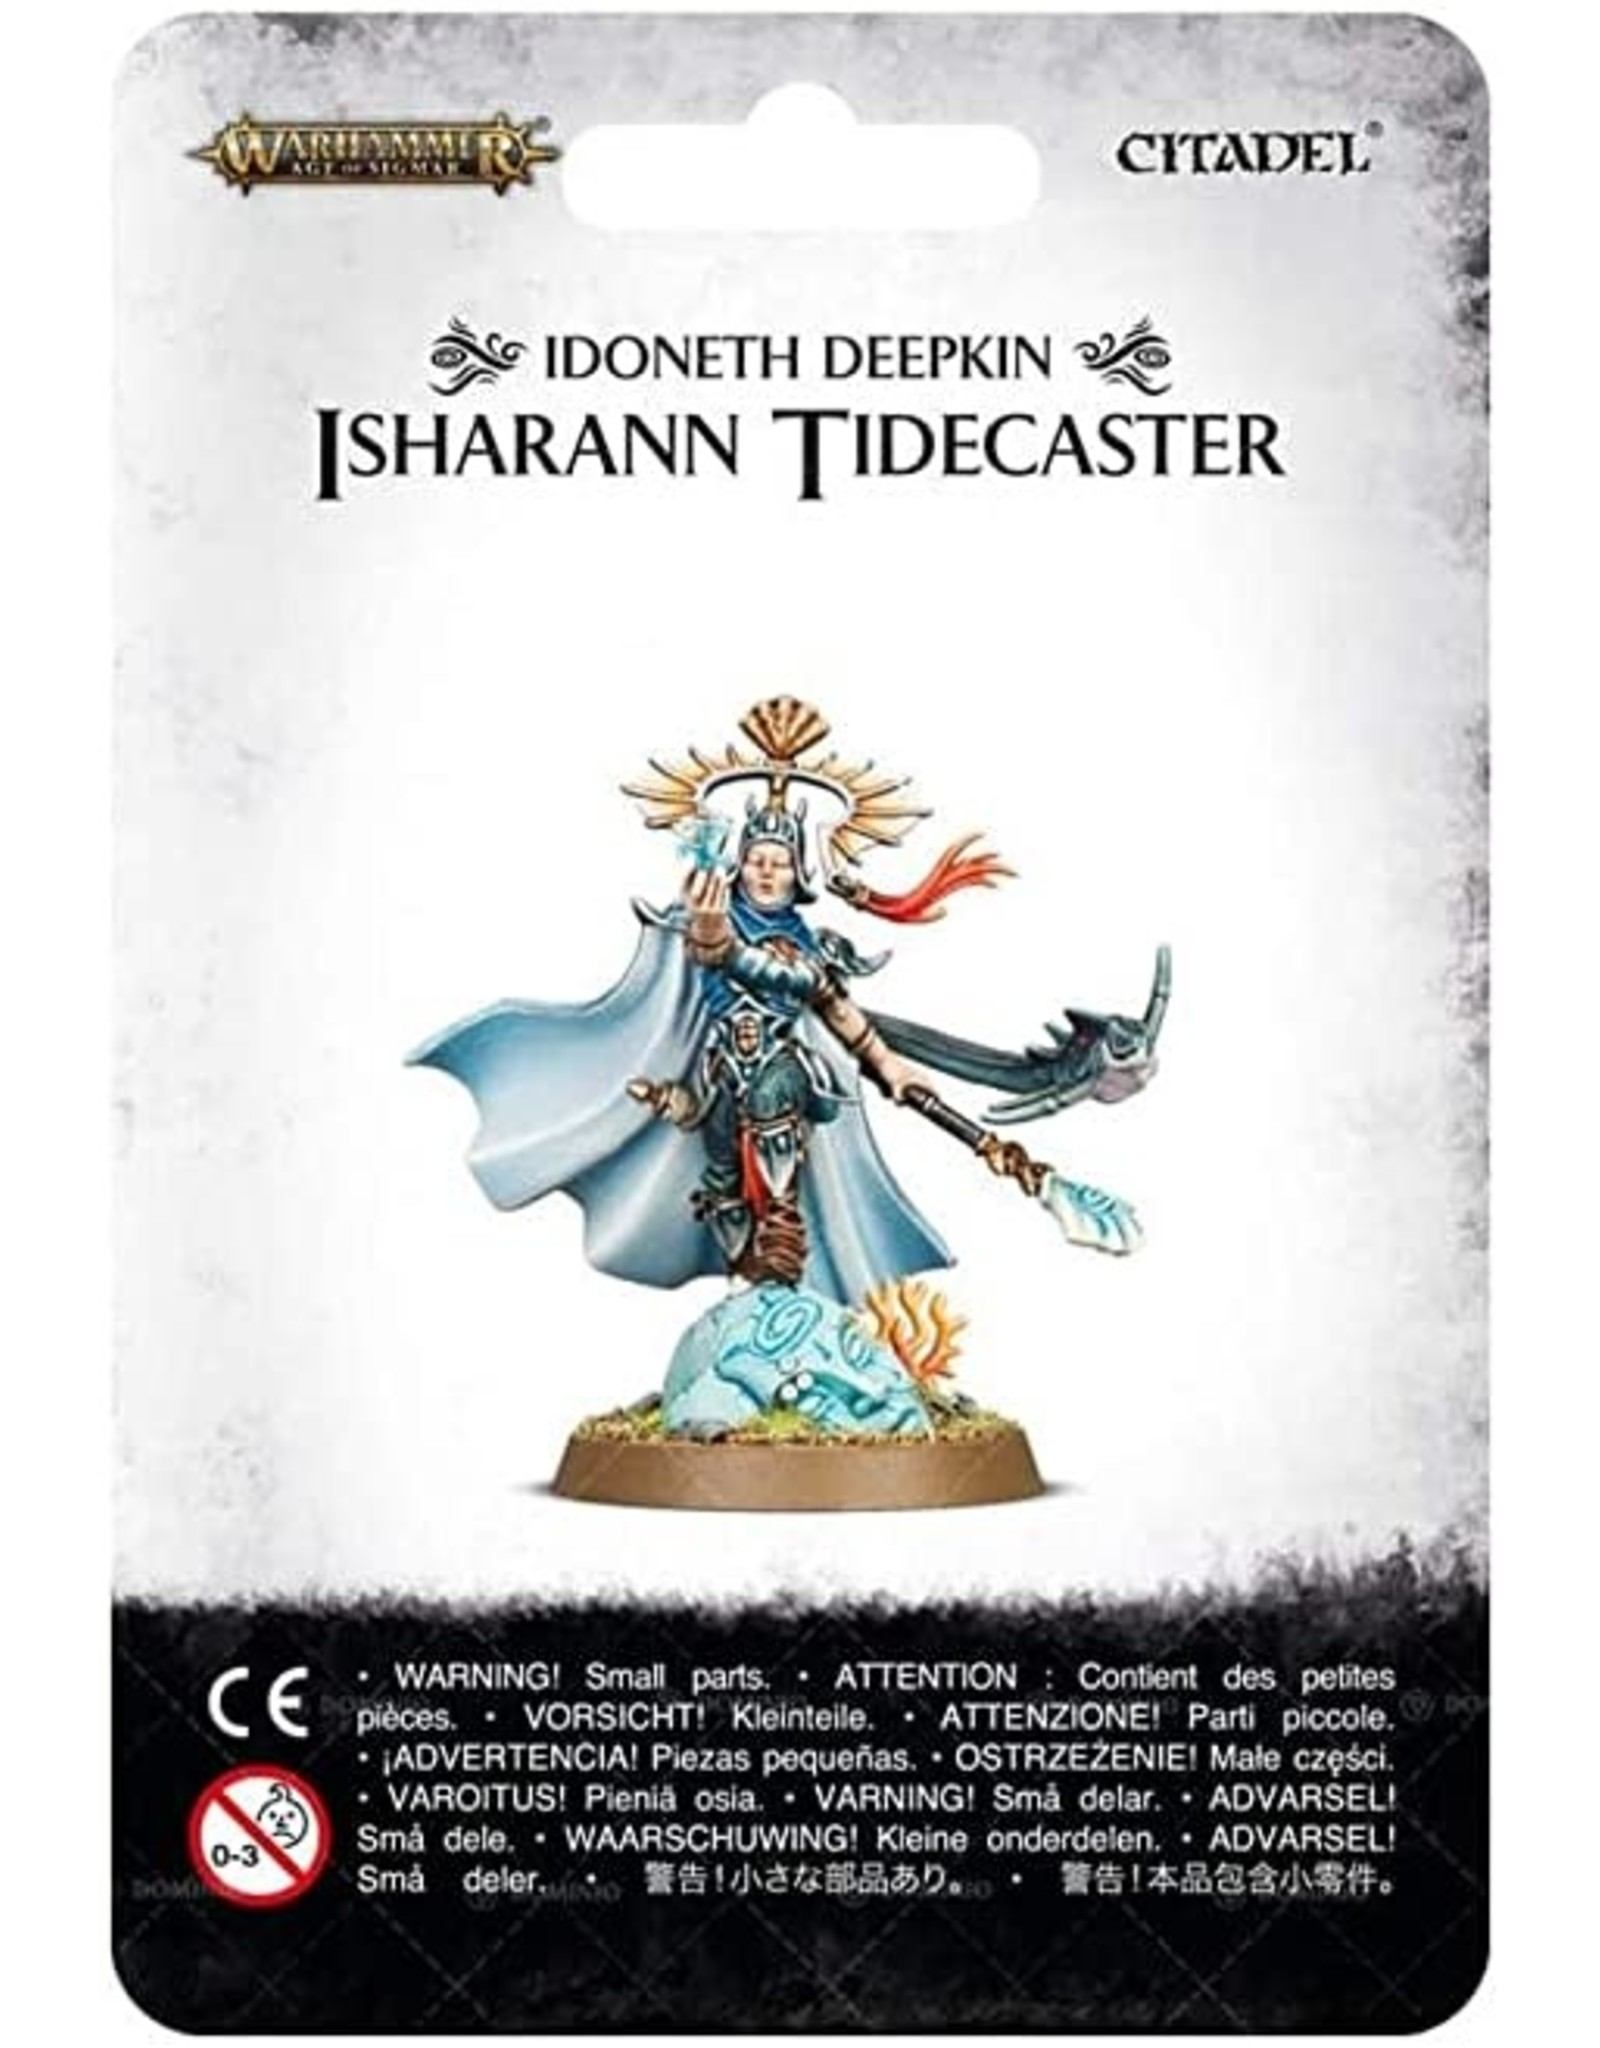 Idoneth Deepkin Isharann Tidecaster (AOS)